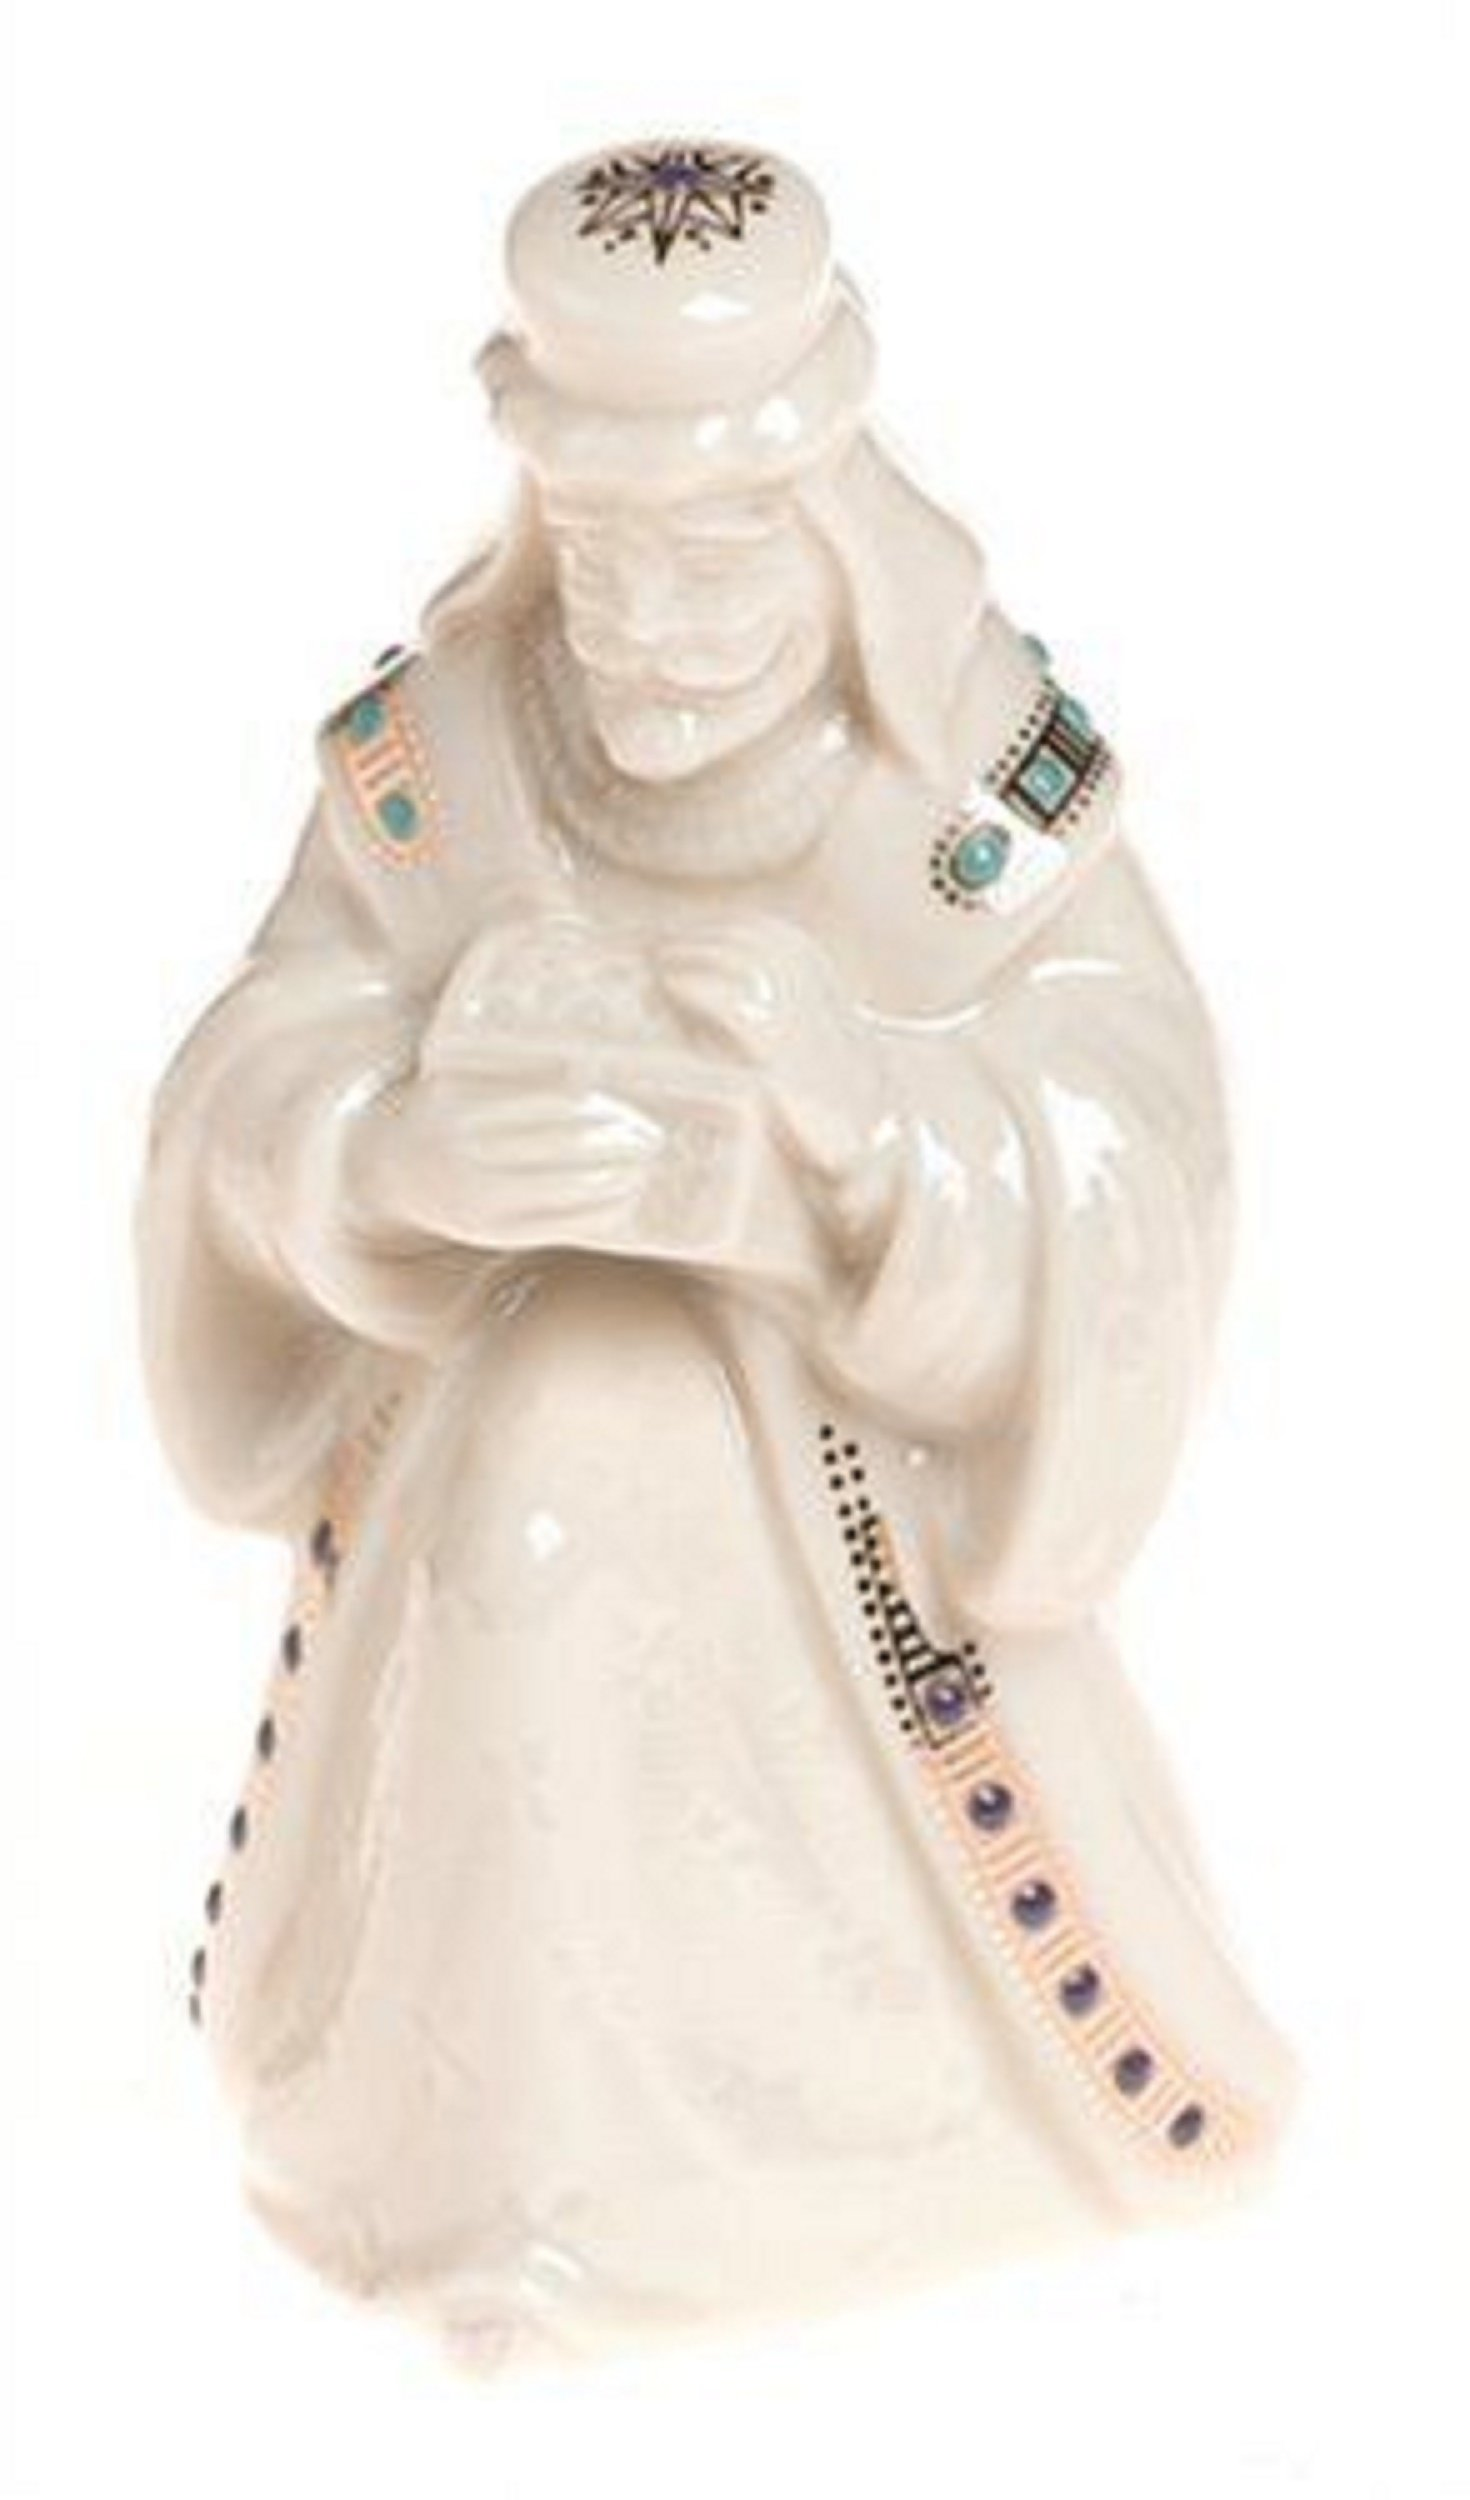 Lenox China Jewels Nativity 3 Wise Men Figurines Three Kings Melchior Balthazaar